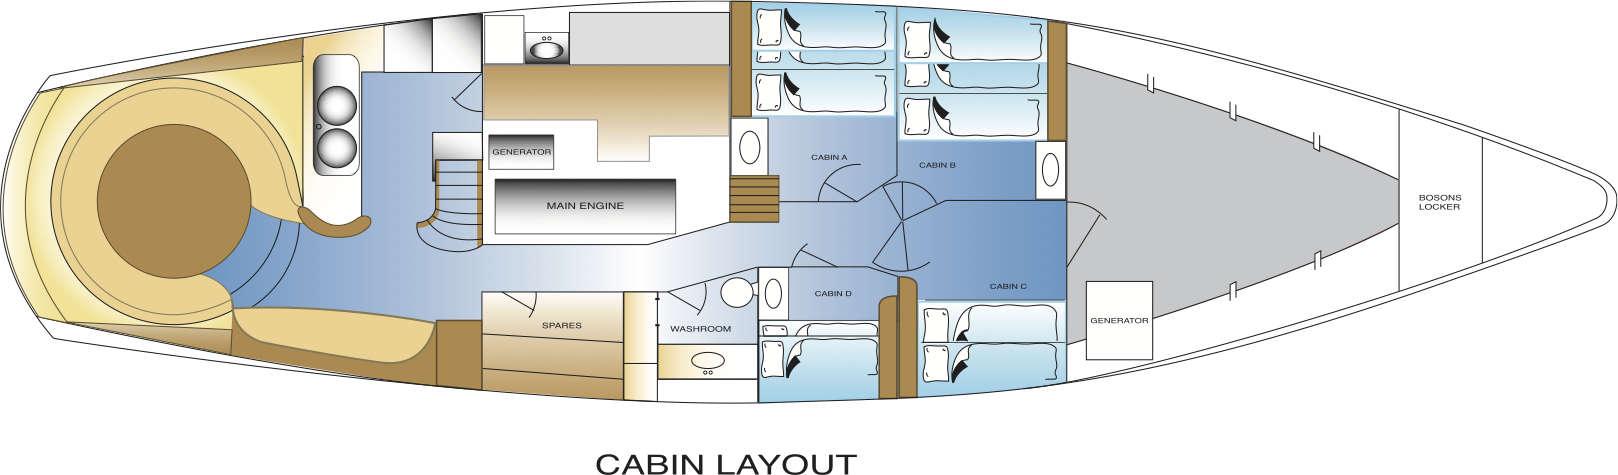 yacht Australis cabin layout antarctica